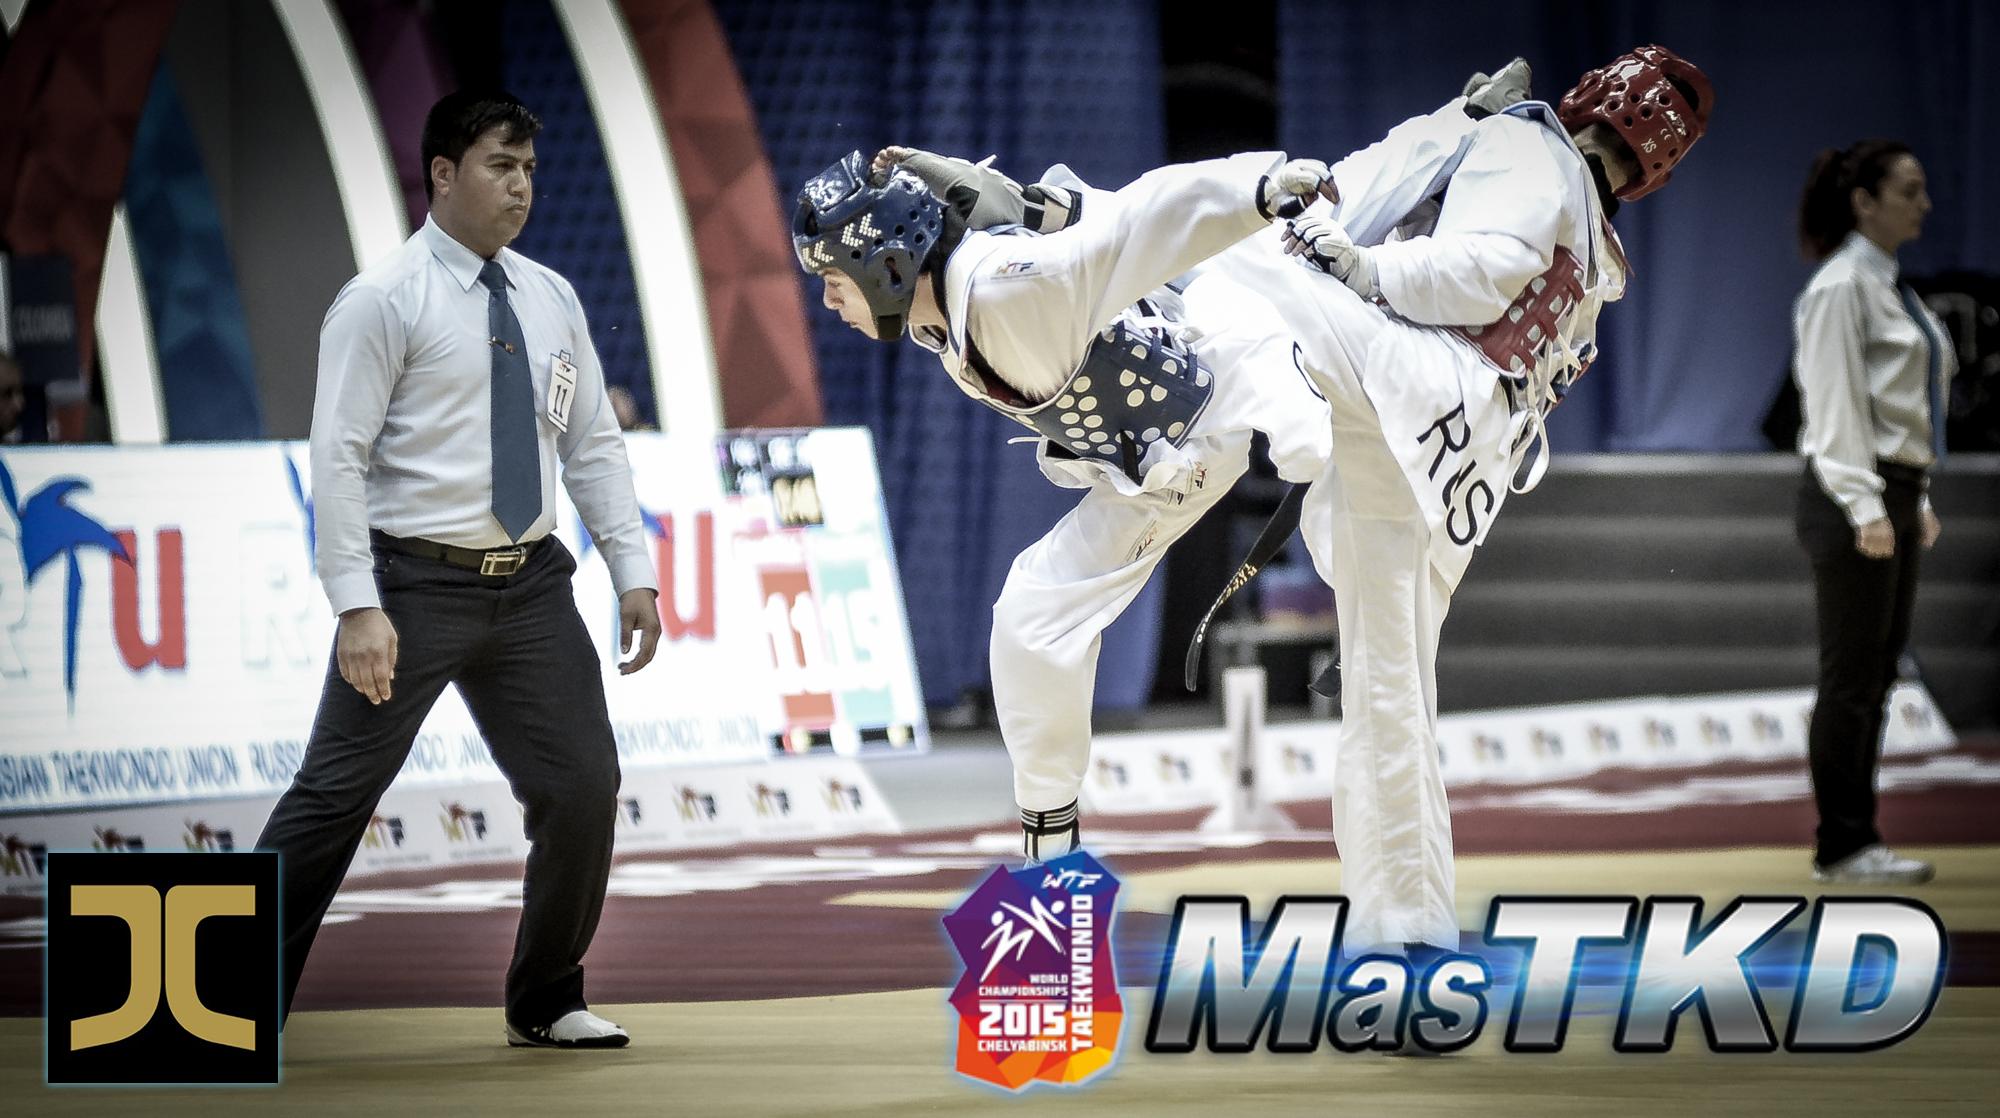 01_JCalicu-Mundial-Taekwondo-Mejores-Imagenes_DSC0119